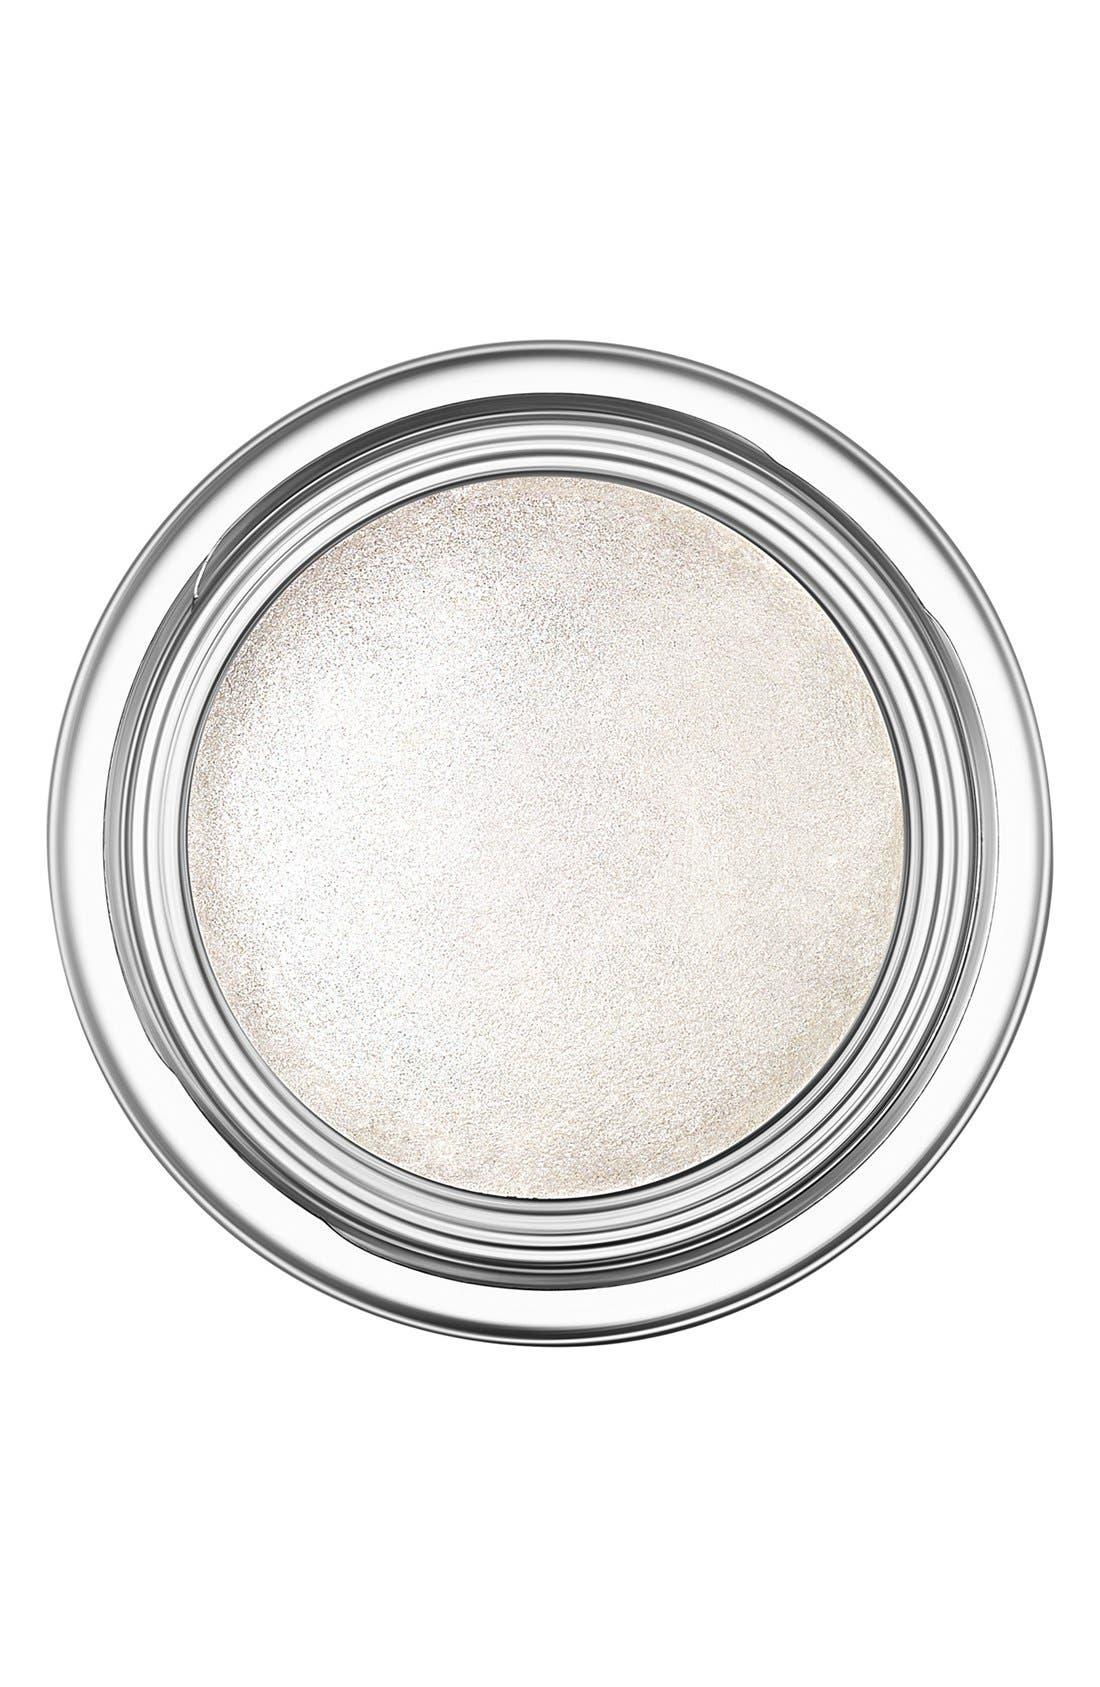 Diorshow Fusion Mono Eyeshadow,                         Main,                         color, 001 LUNE